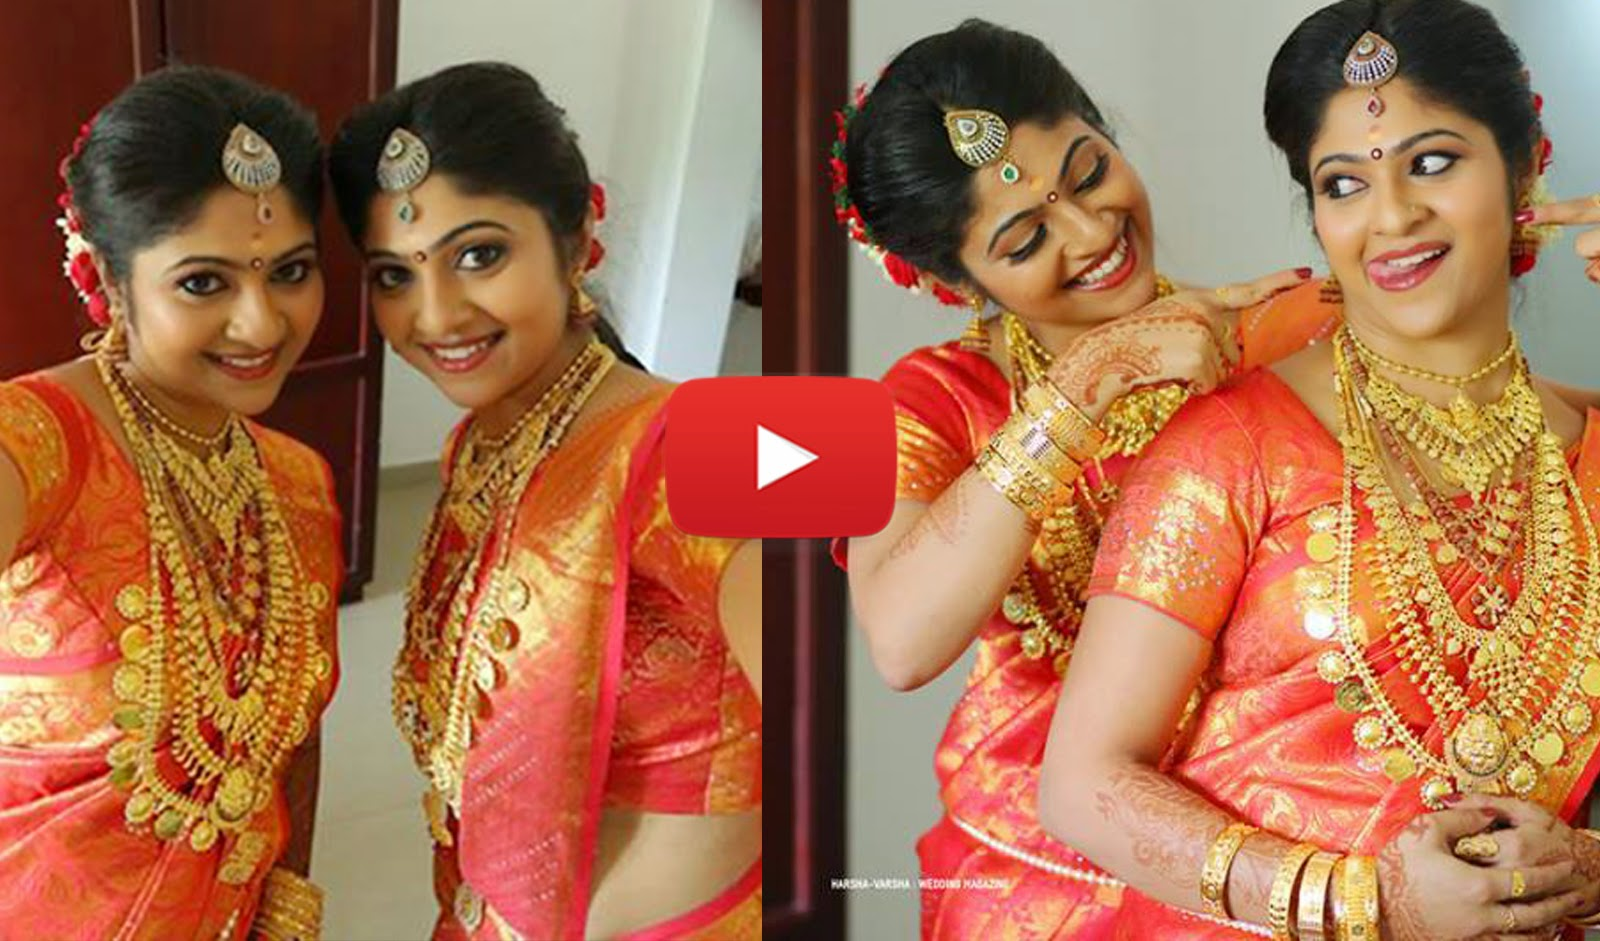 Kerala wedding photos muslim wedding photos wedding kerala wedding - Beautiful Twins Wedding Kerala